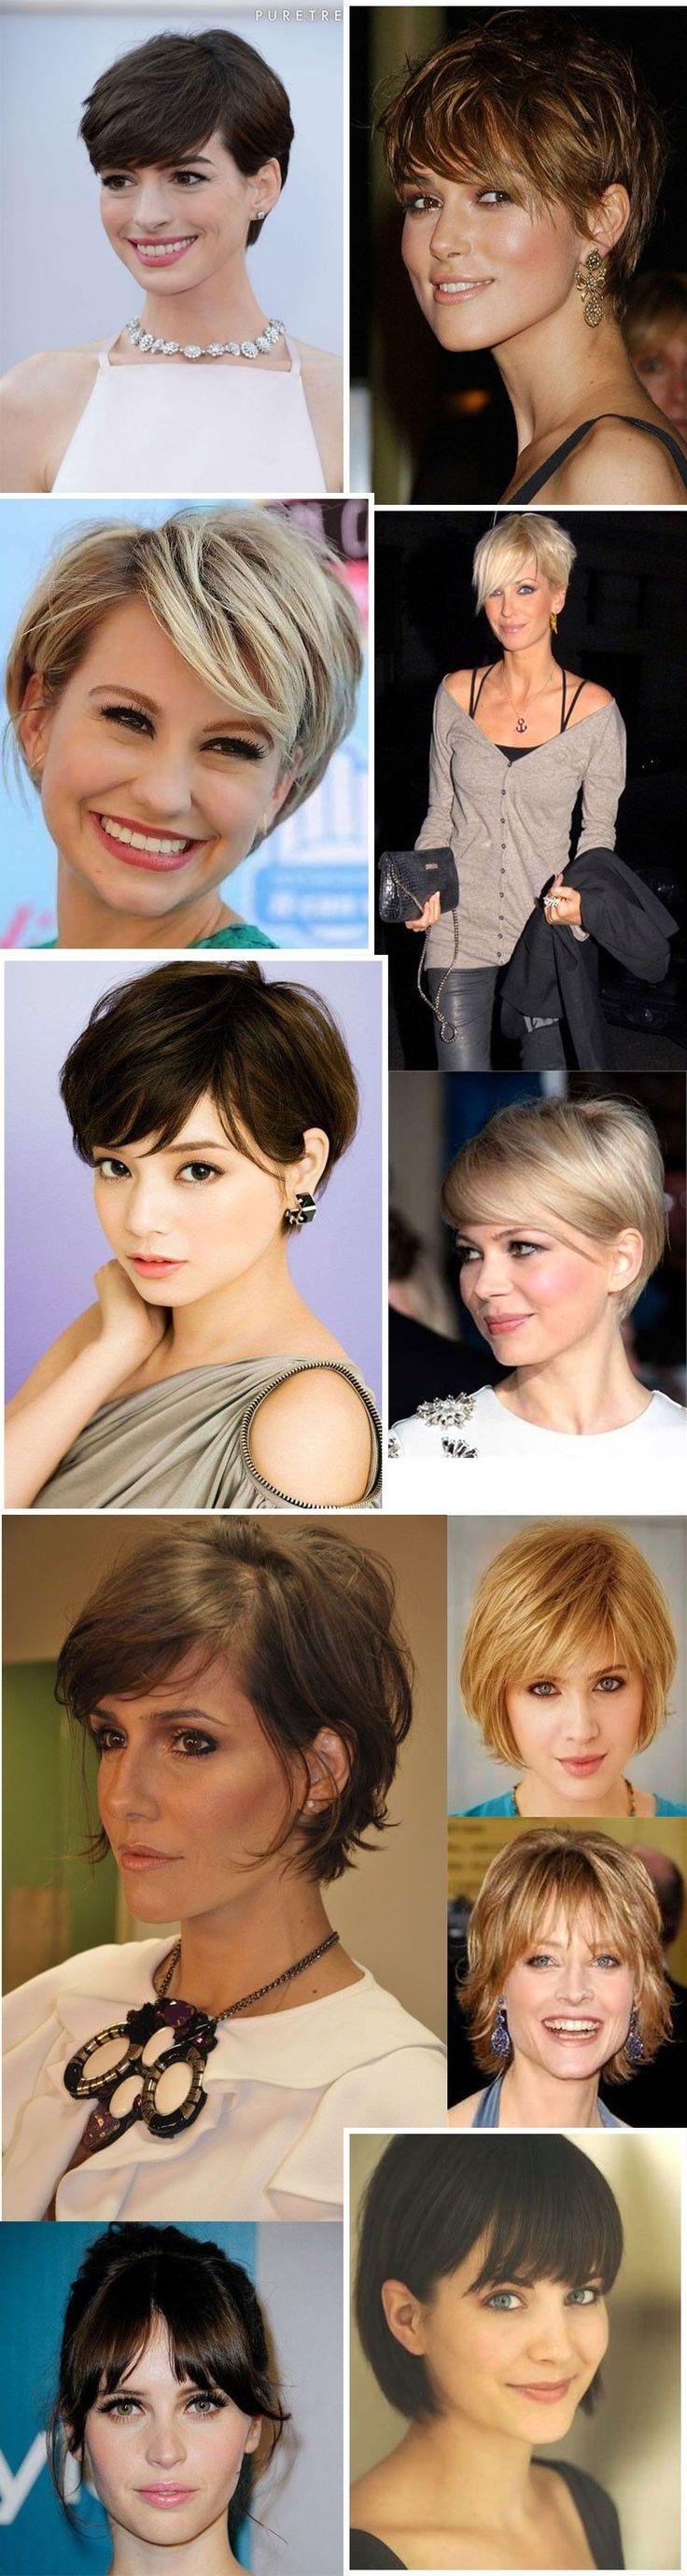 cabelos com franja curtos